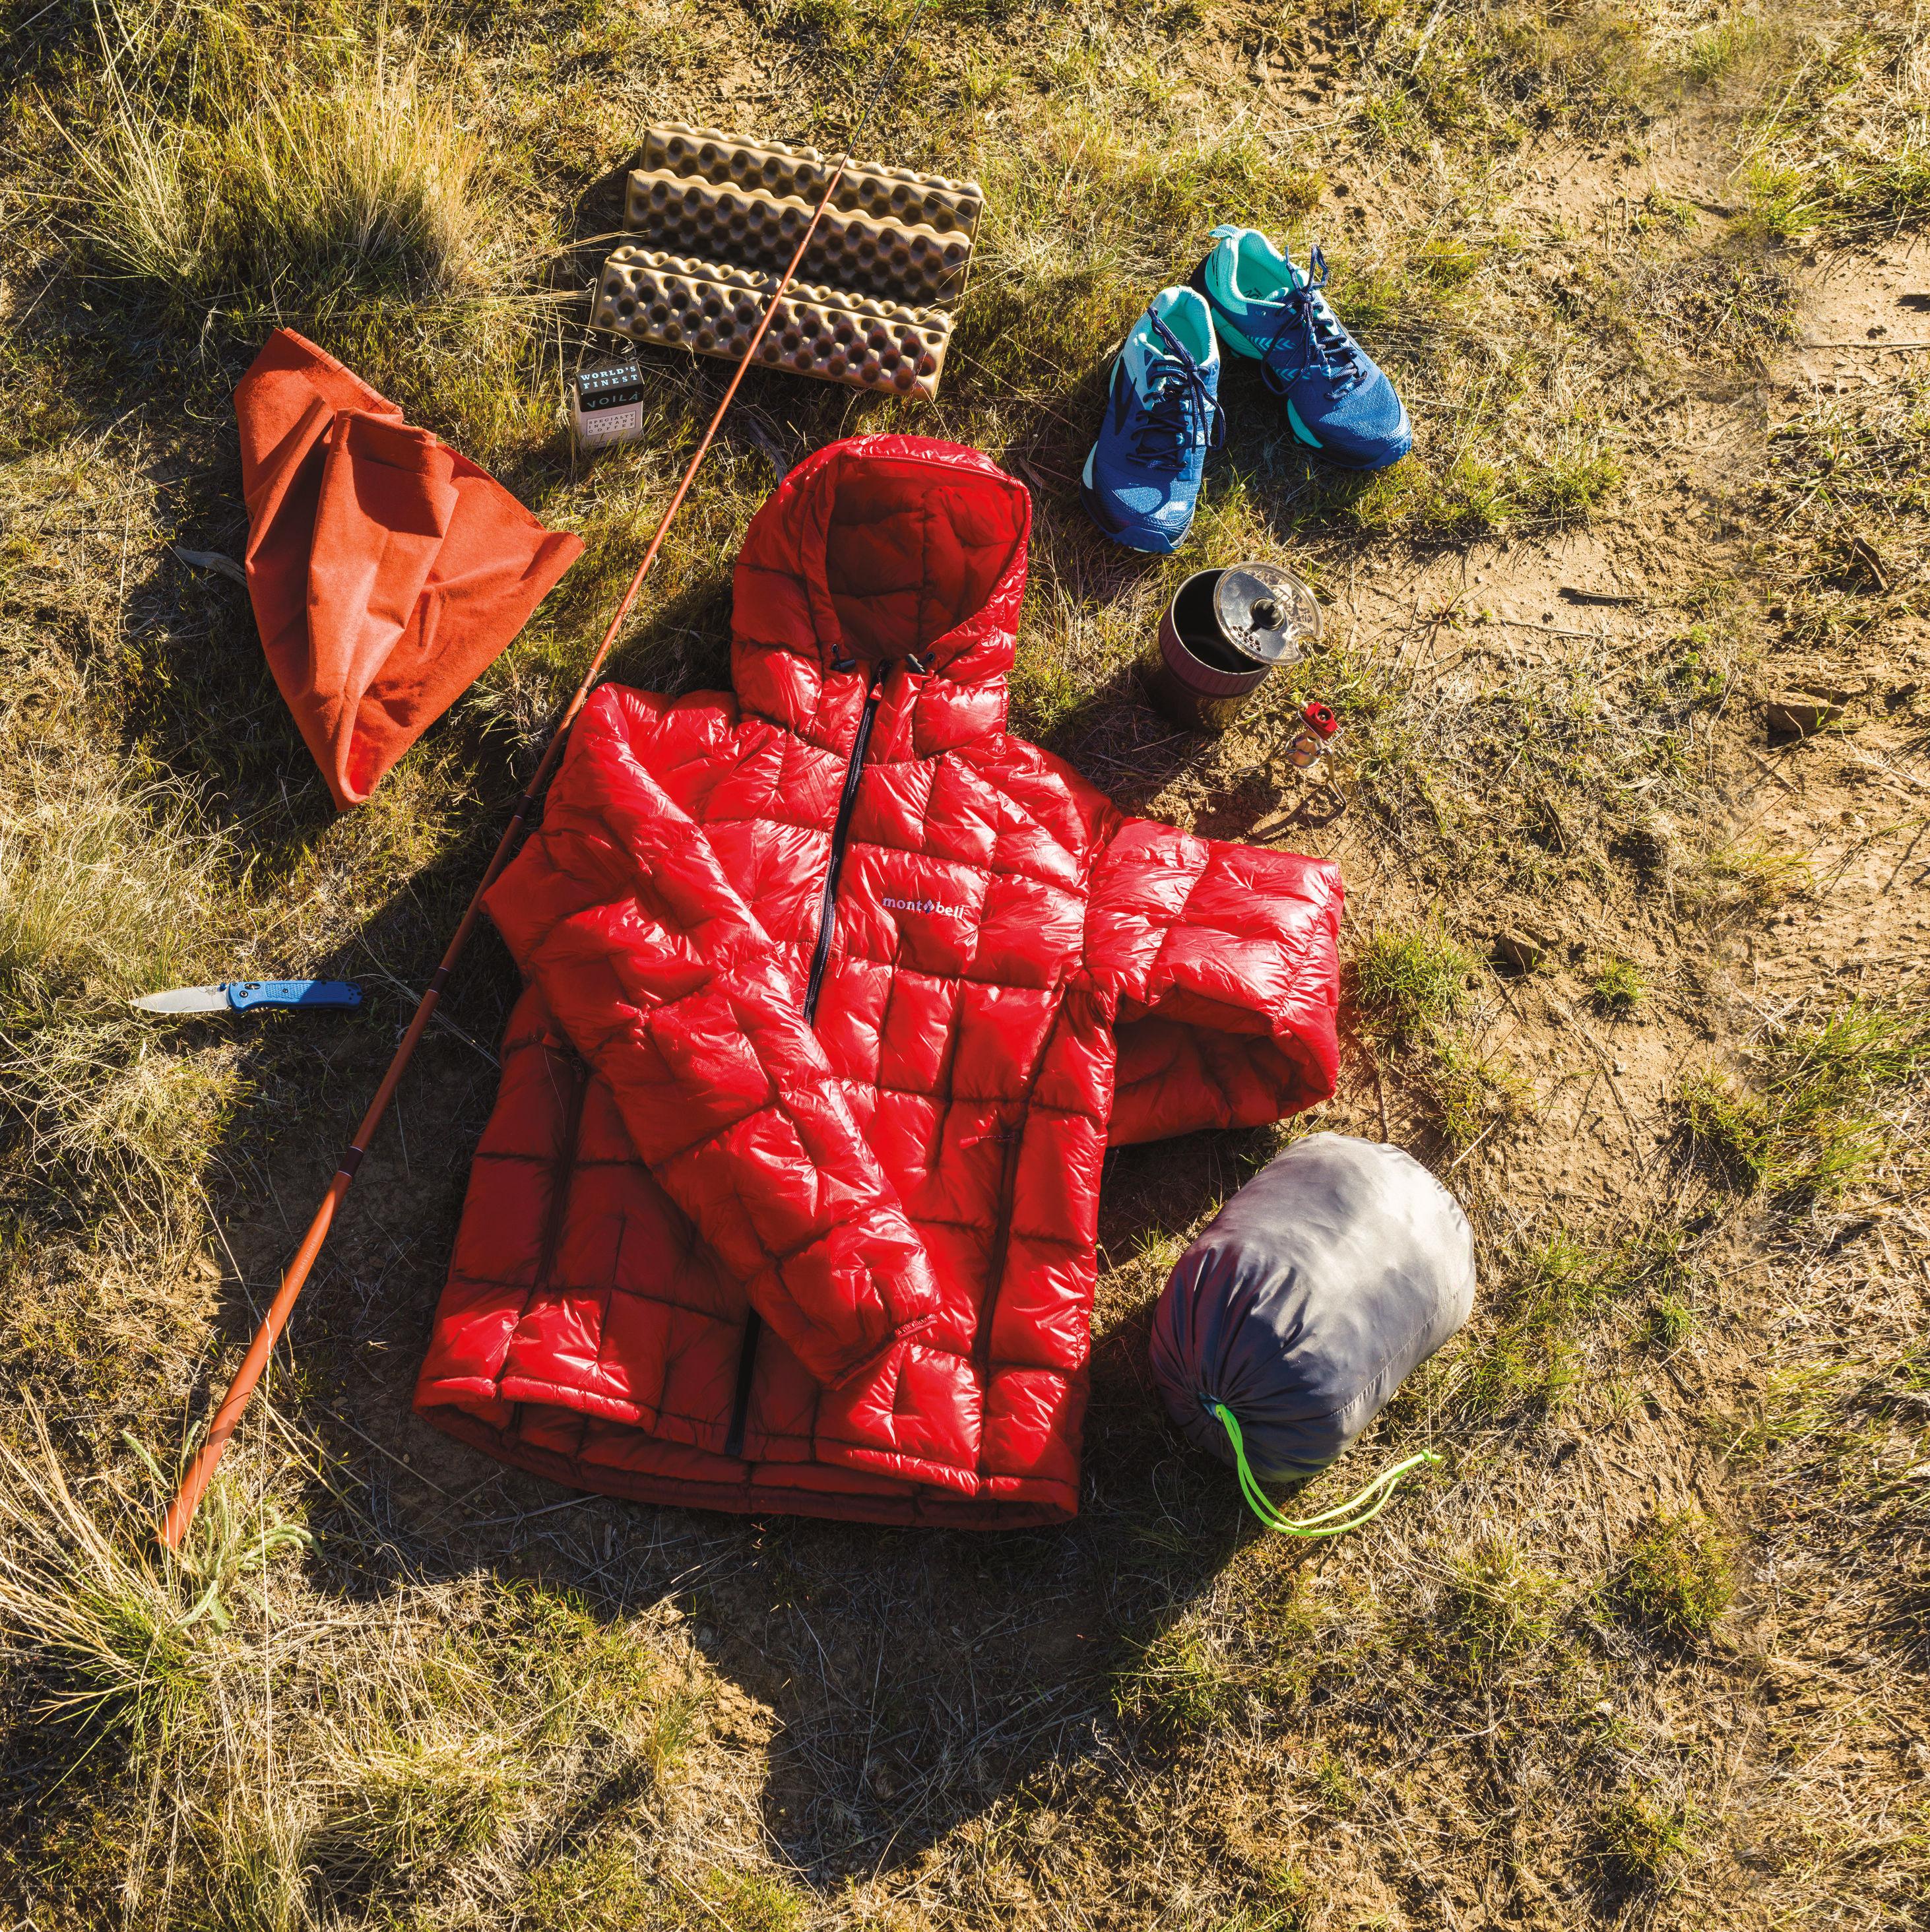 0618 camping guide backpacking gear tcqapq